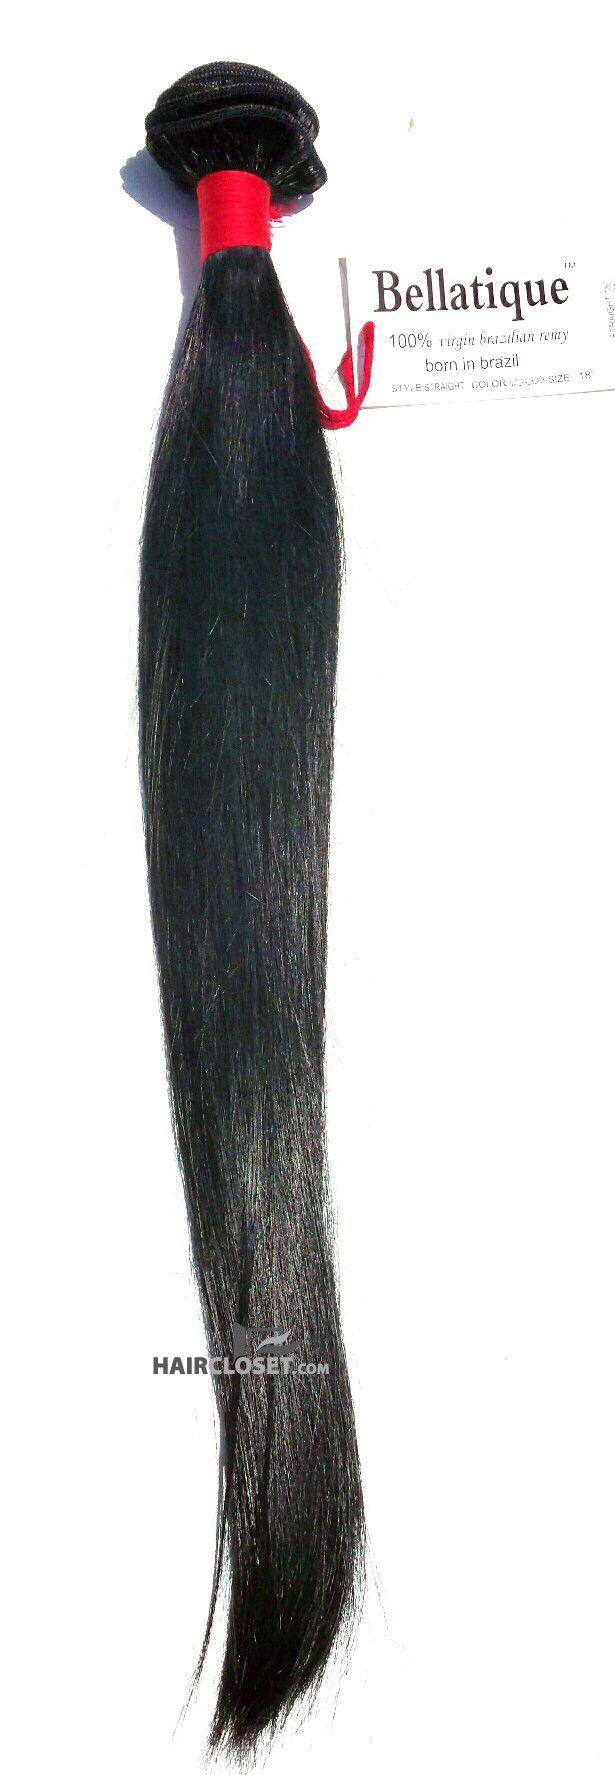 Straight perm bleached hair - Bellatique Brazilian Virgin Remy Hair Straight